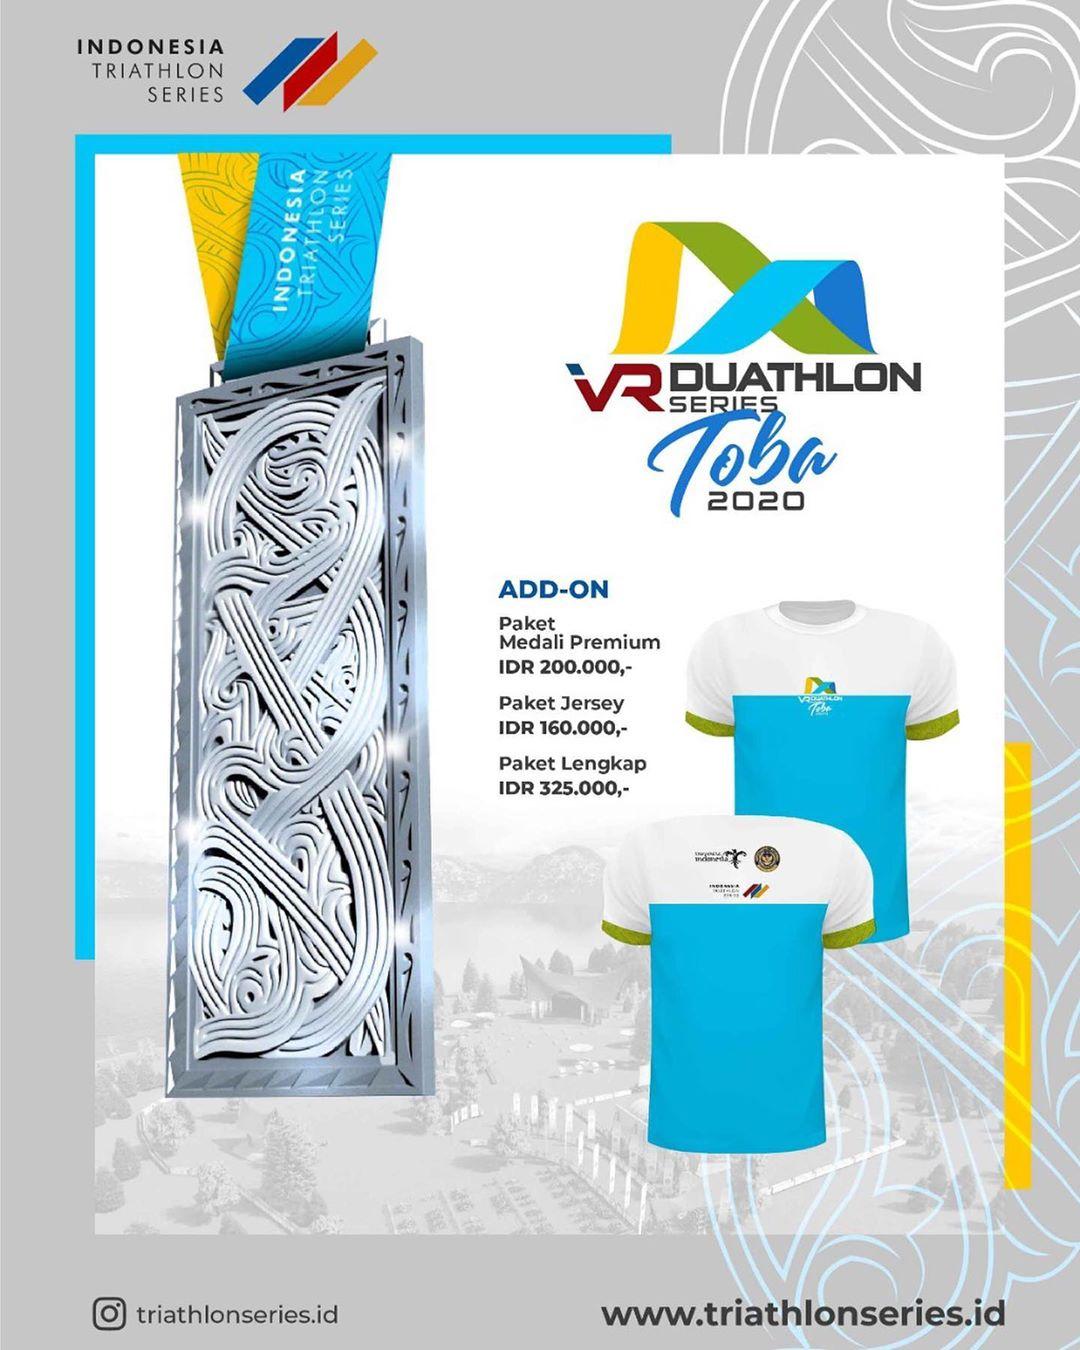 Indonesia Triathlon Series - VR Duathlon Series ∙ Toba • 2020